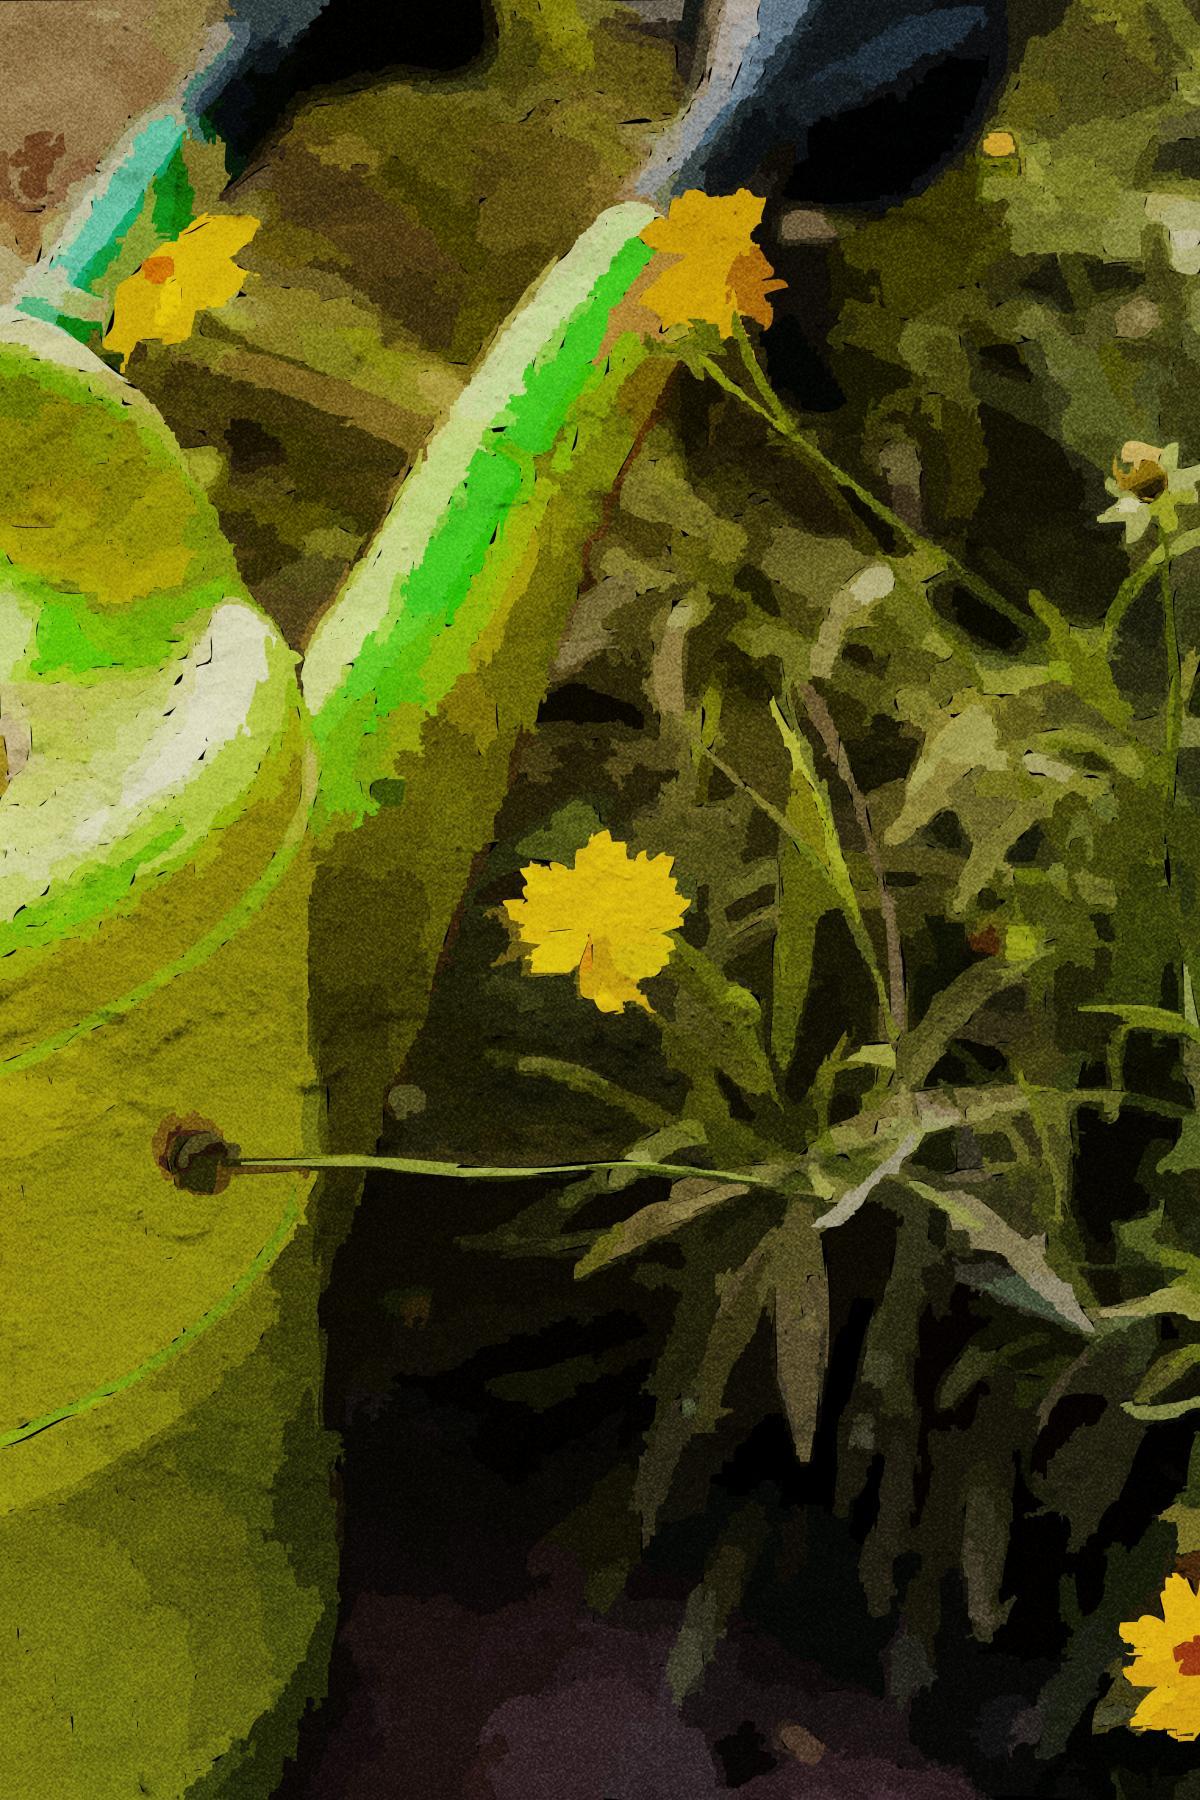 Spring Pest Control Solutions - Humboldt Termite & Pest